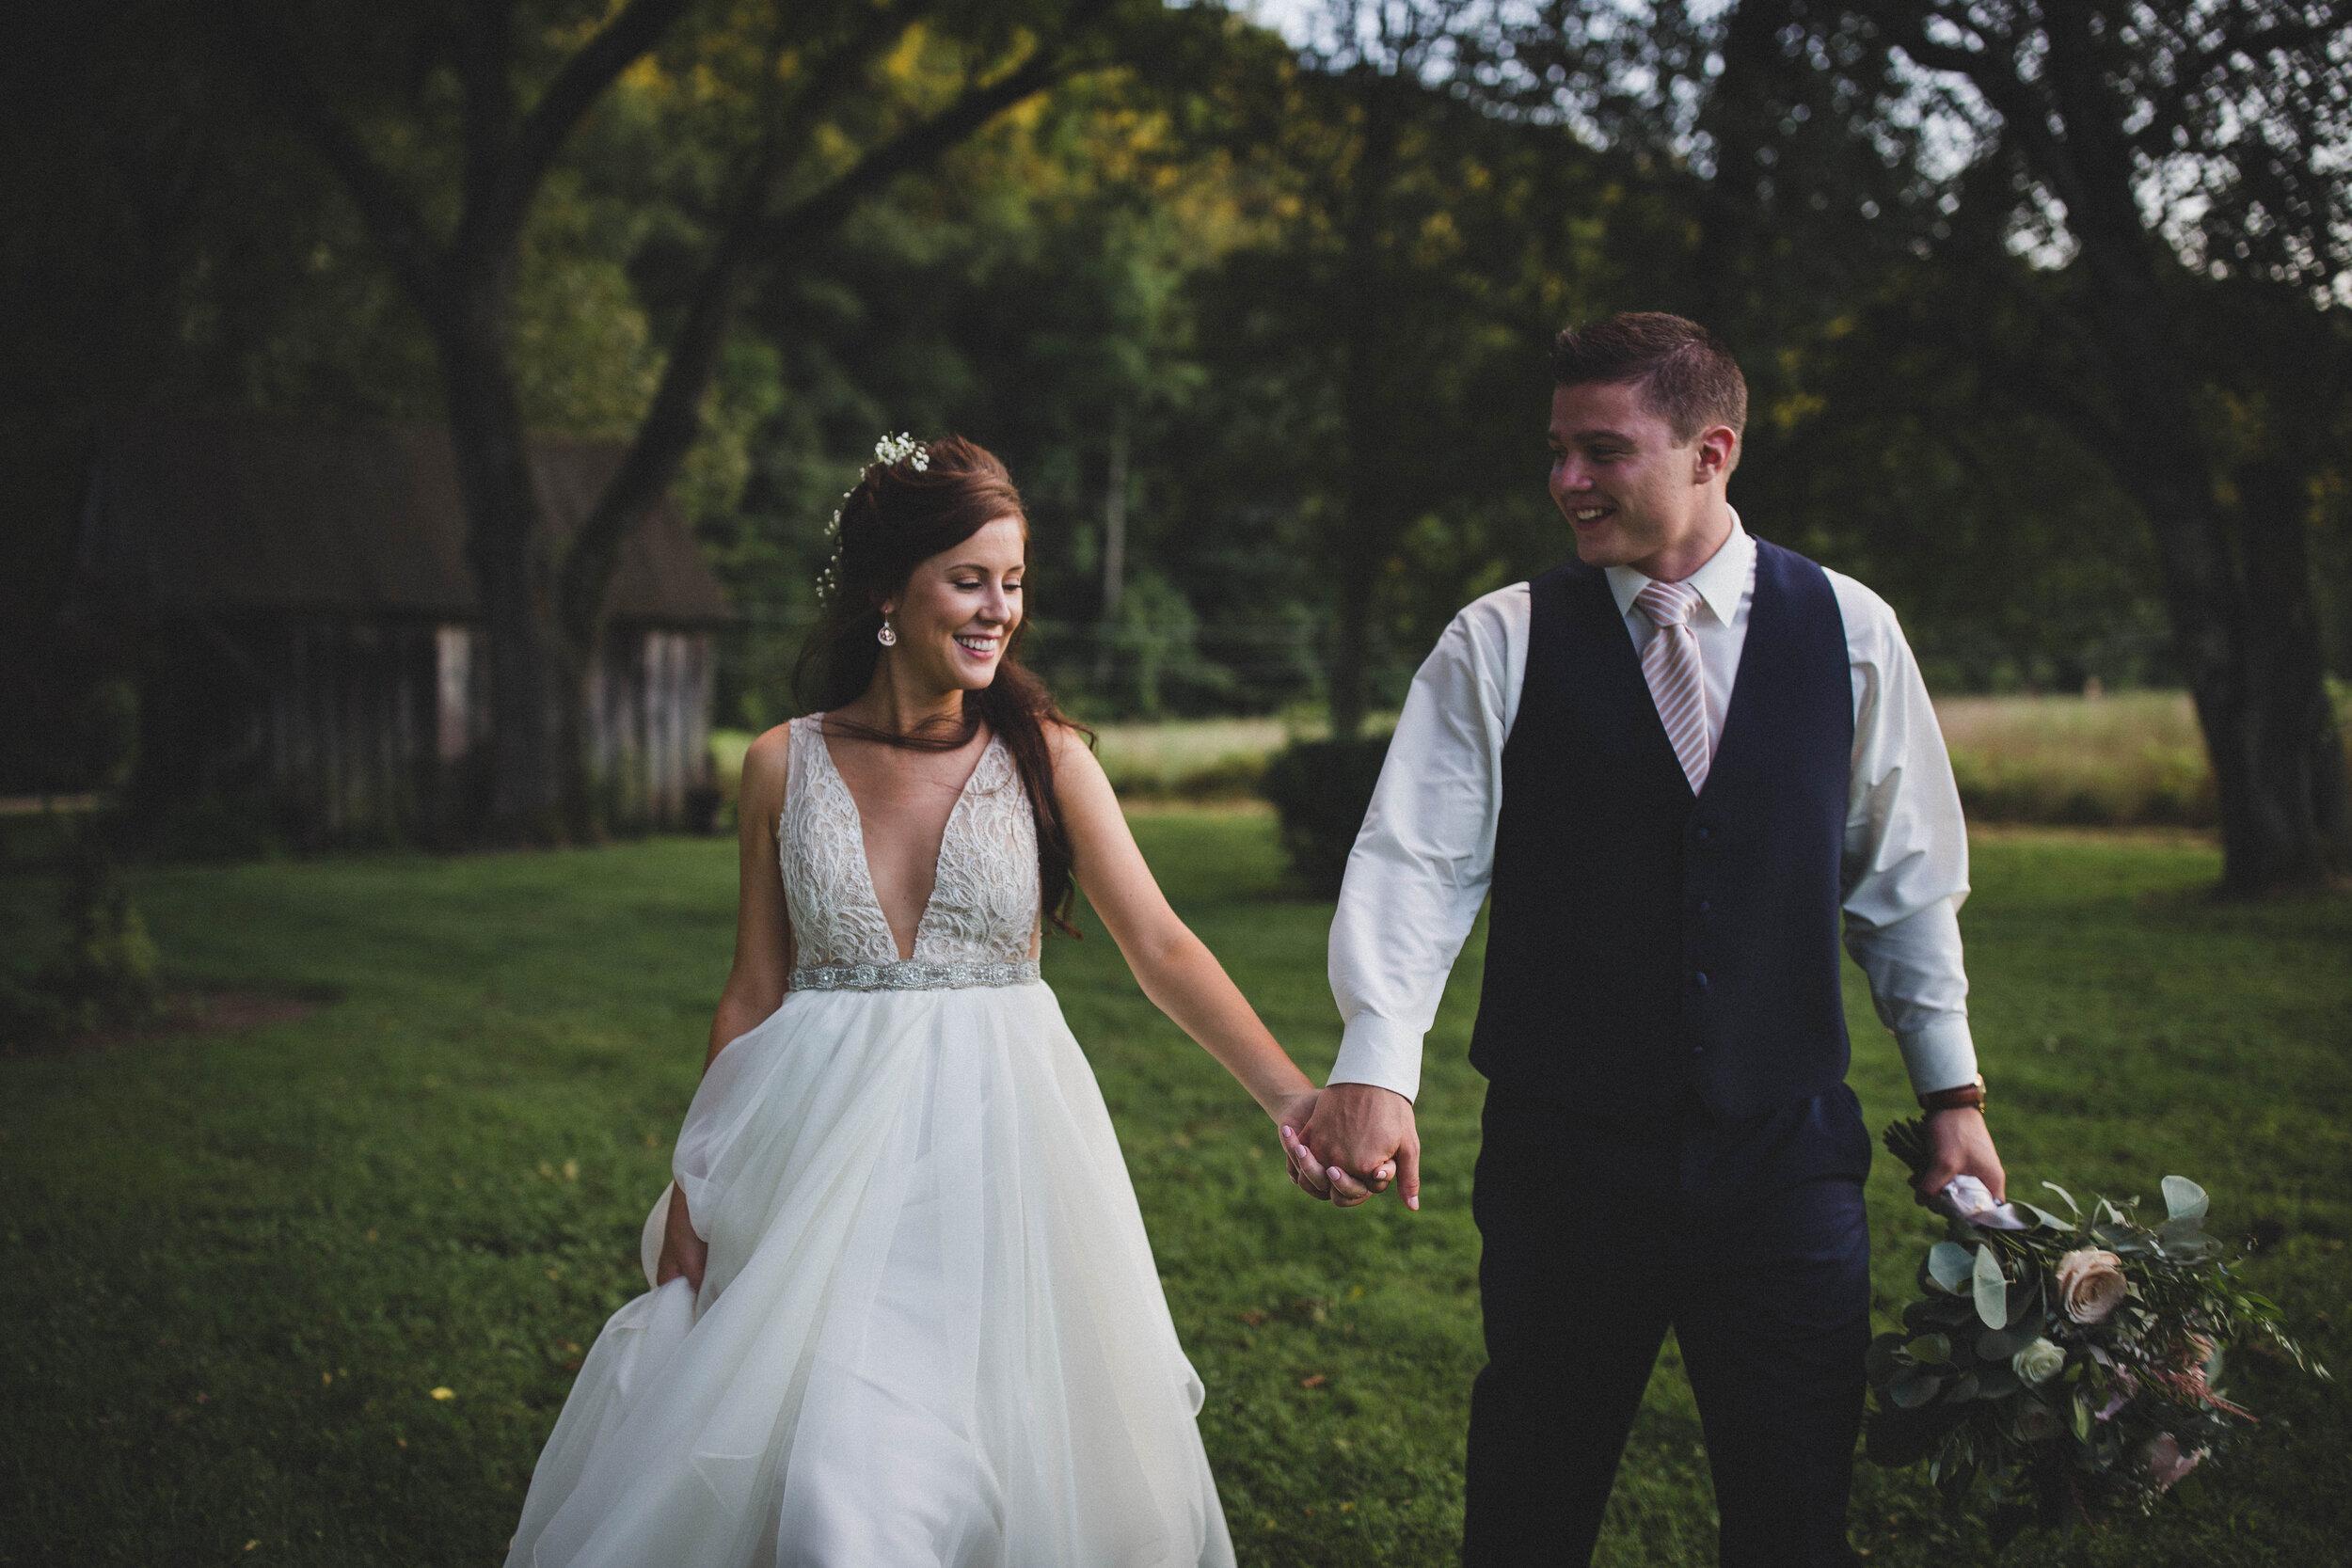 ERP_2018_Savannah-Tyler_nashville-tennessee-farm-Wedding-photographer-drakewood-farm_0438.jpg